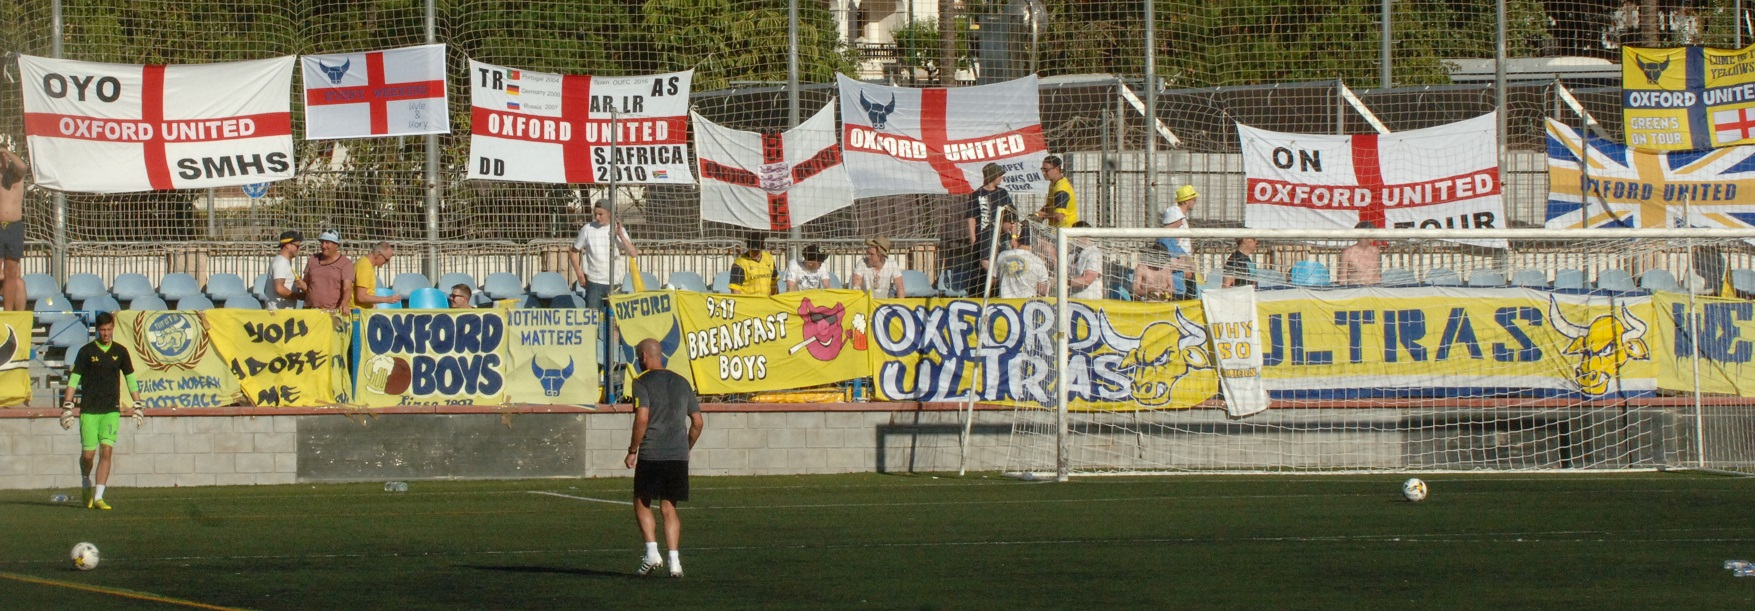 LIVE: Alhaurin de la Torre v Oxford United - Oxford Mail